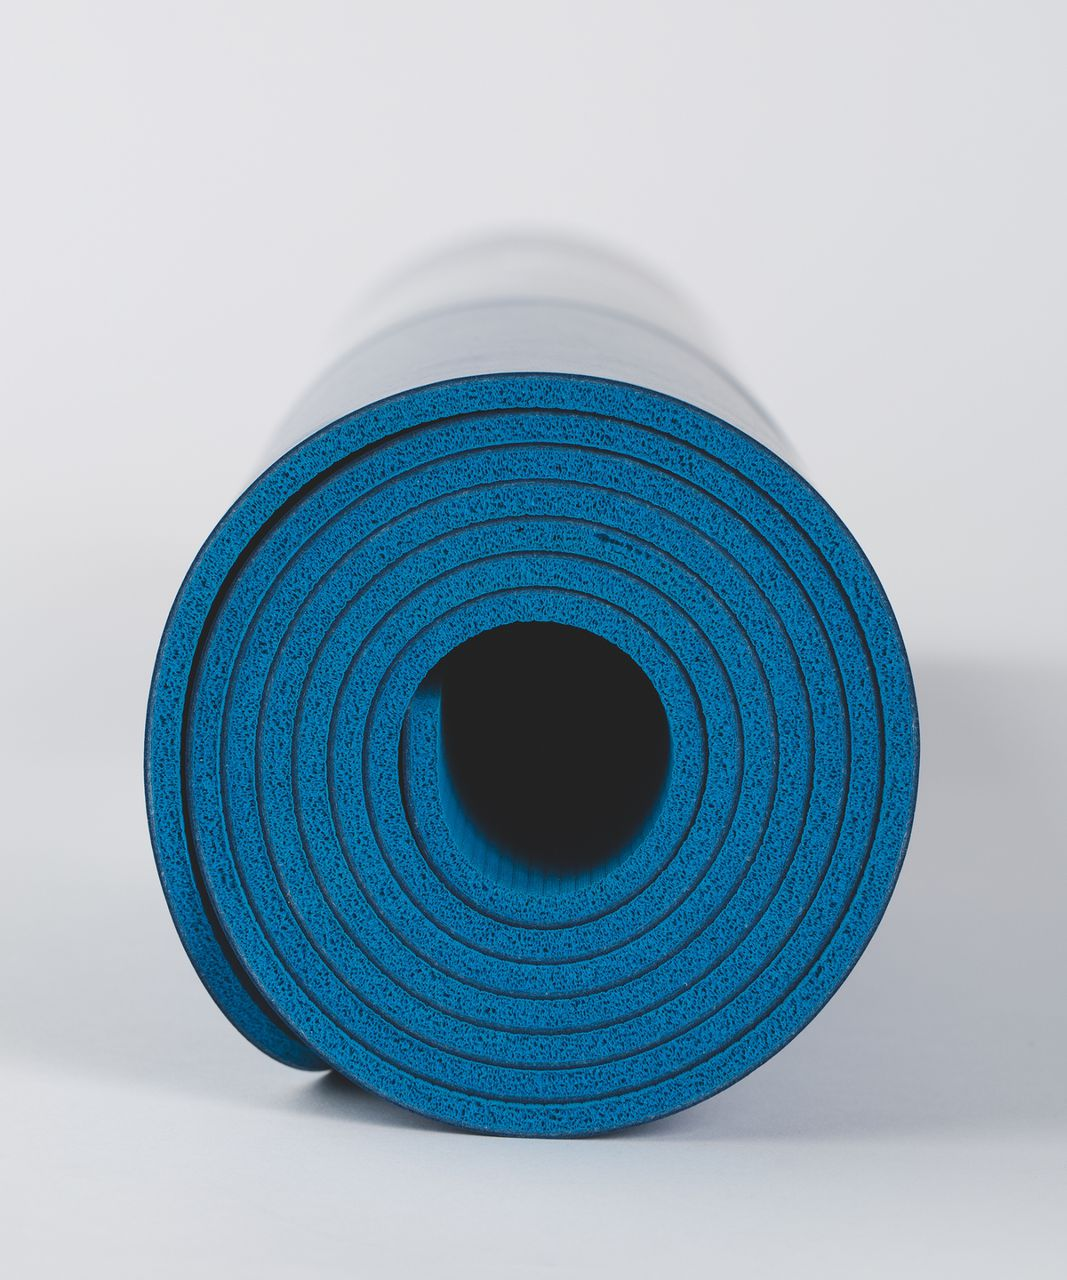 Lululemon The Reversible Mat 5mm - Jet Set Blue / White / Shocking Blue